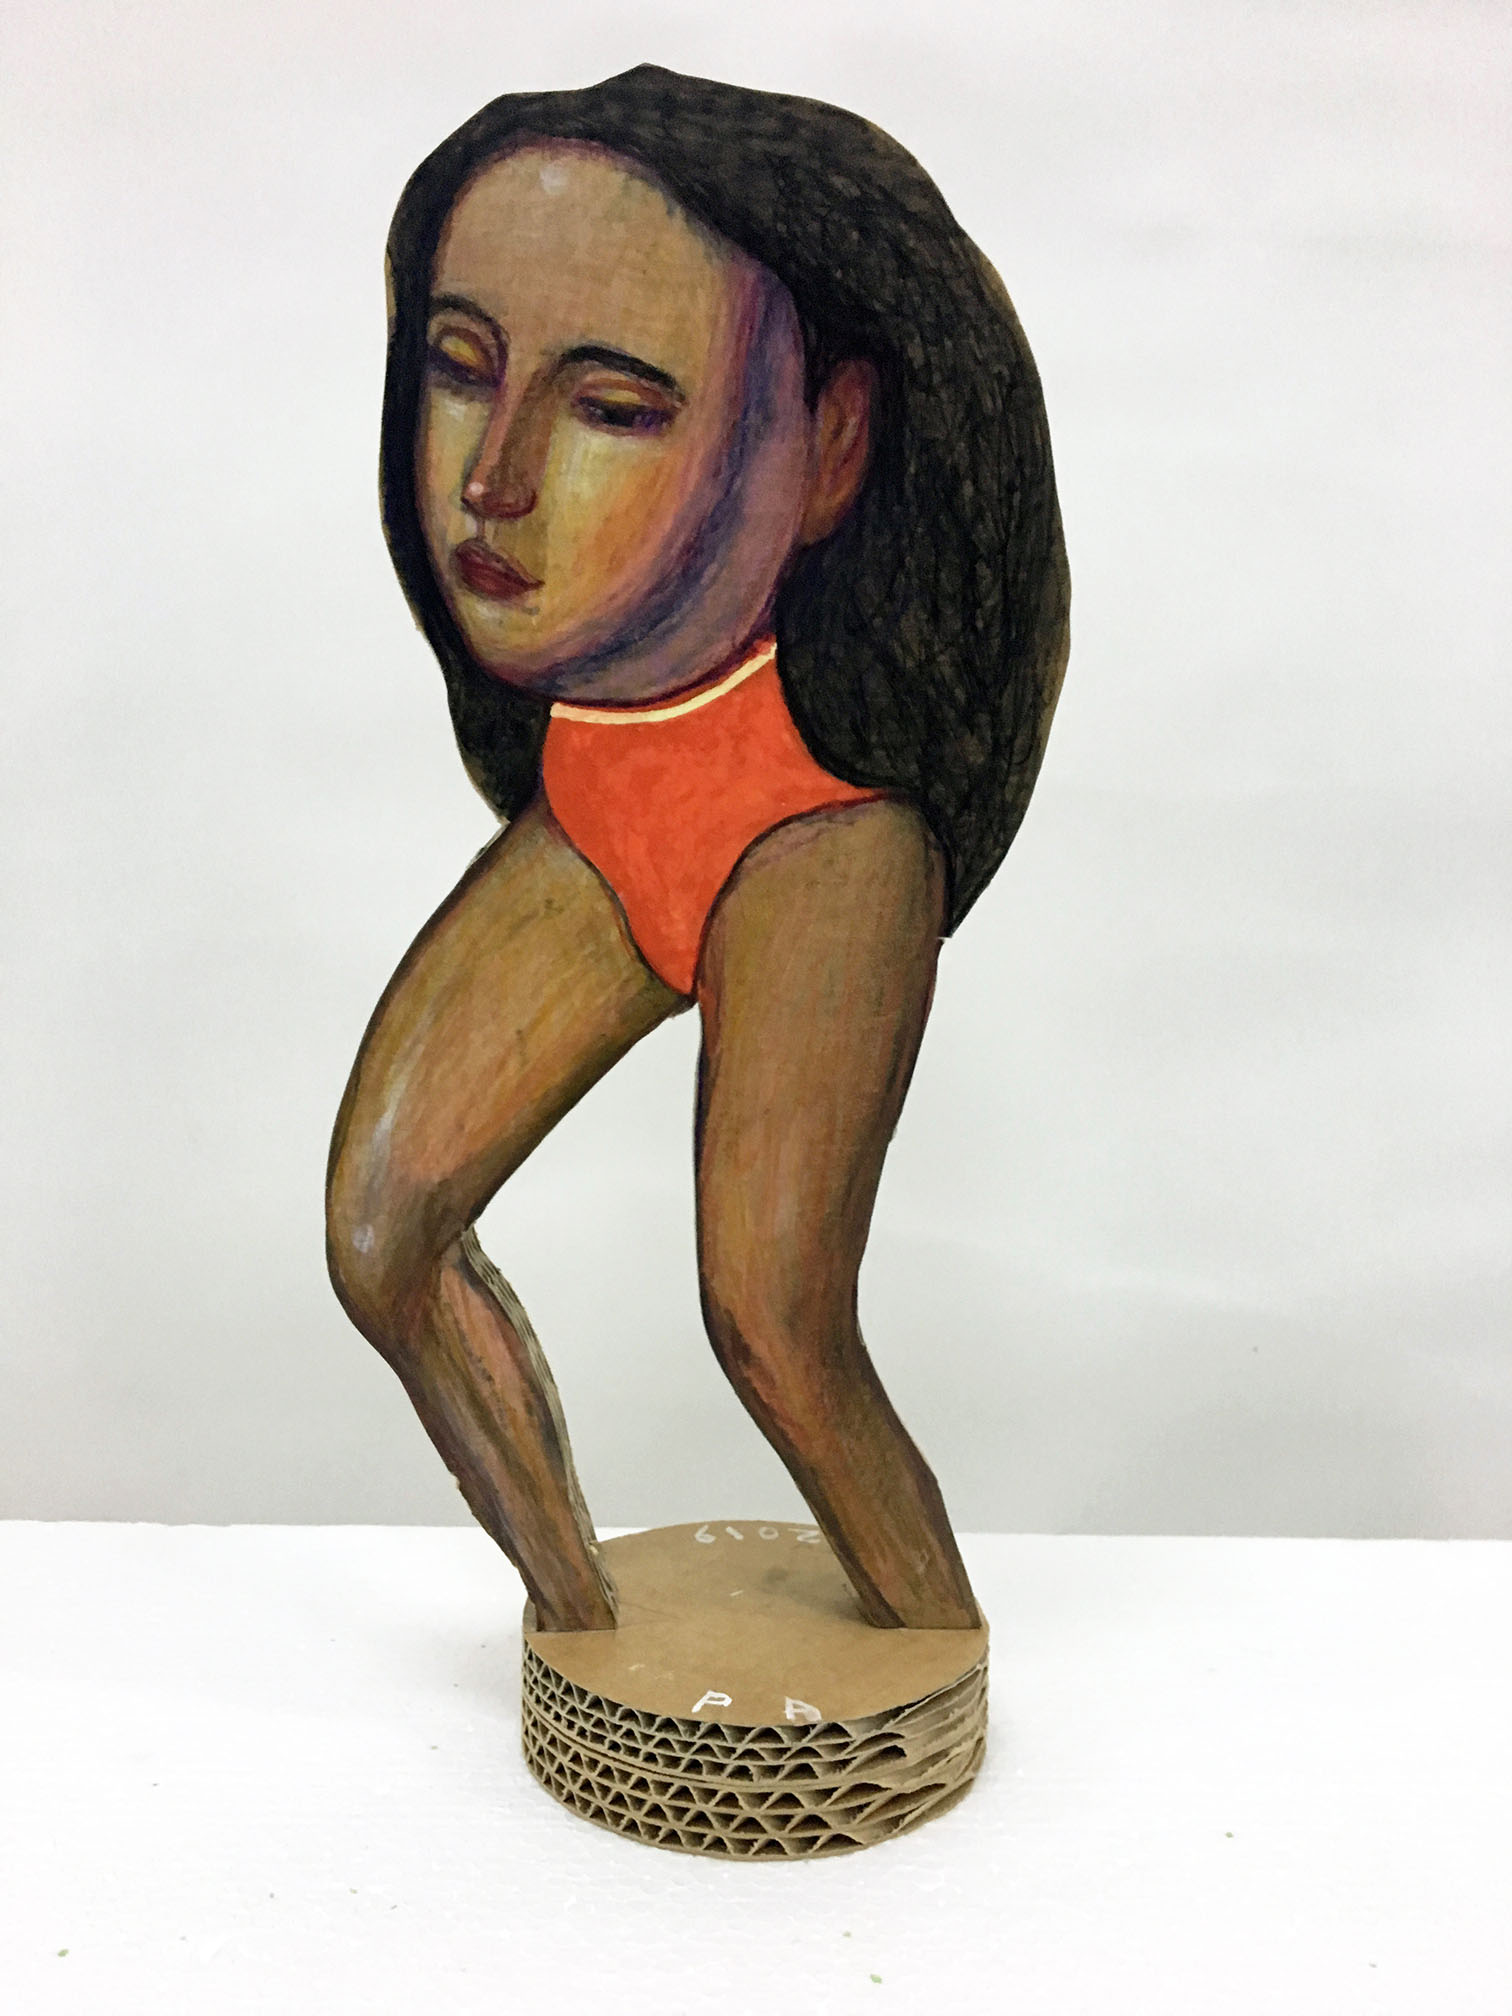 Pat Andrea, Cephalopode, mixed media on carton, 40 x 40 cm, 2020